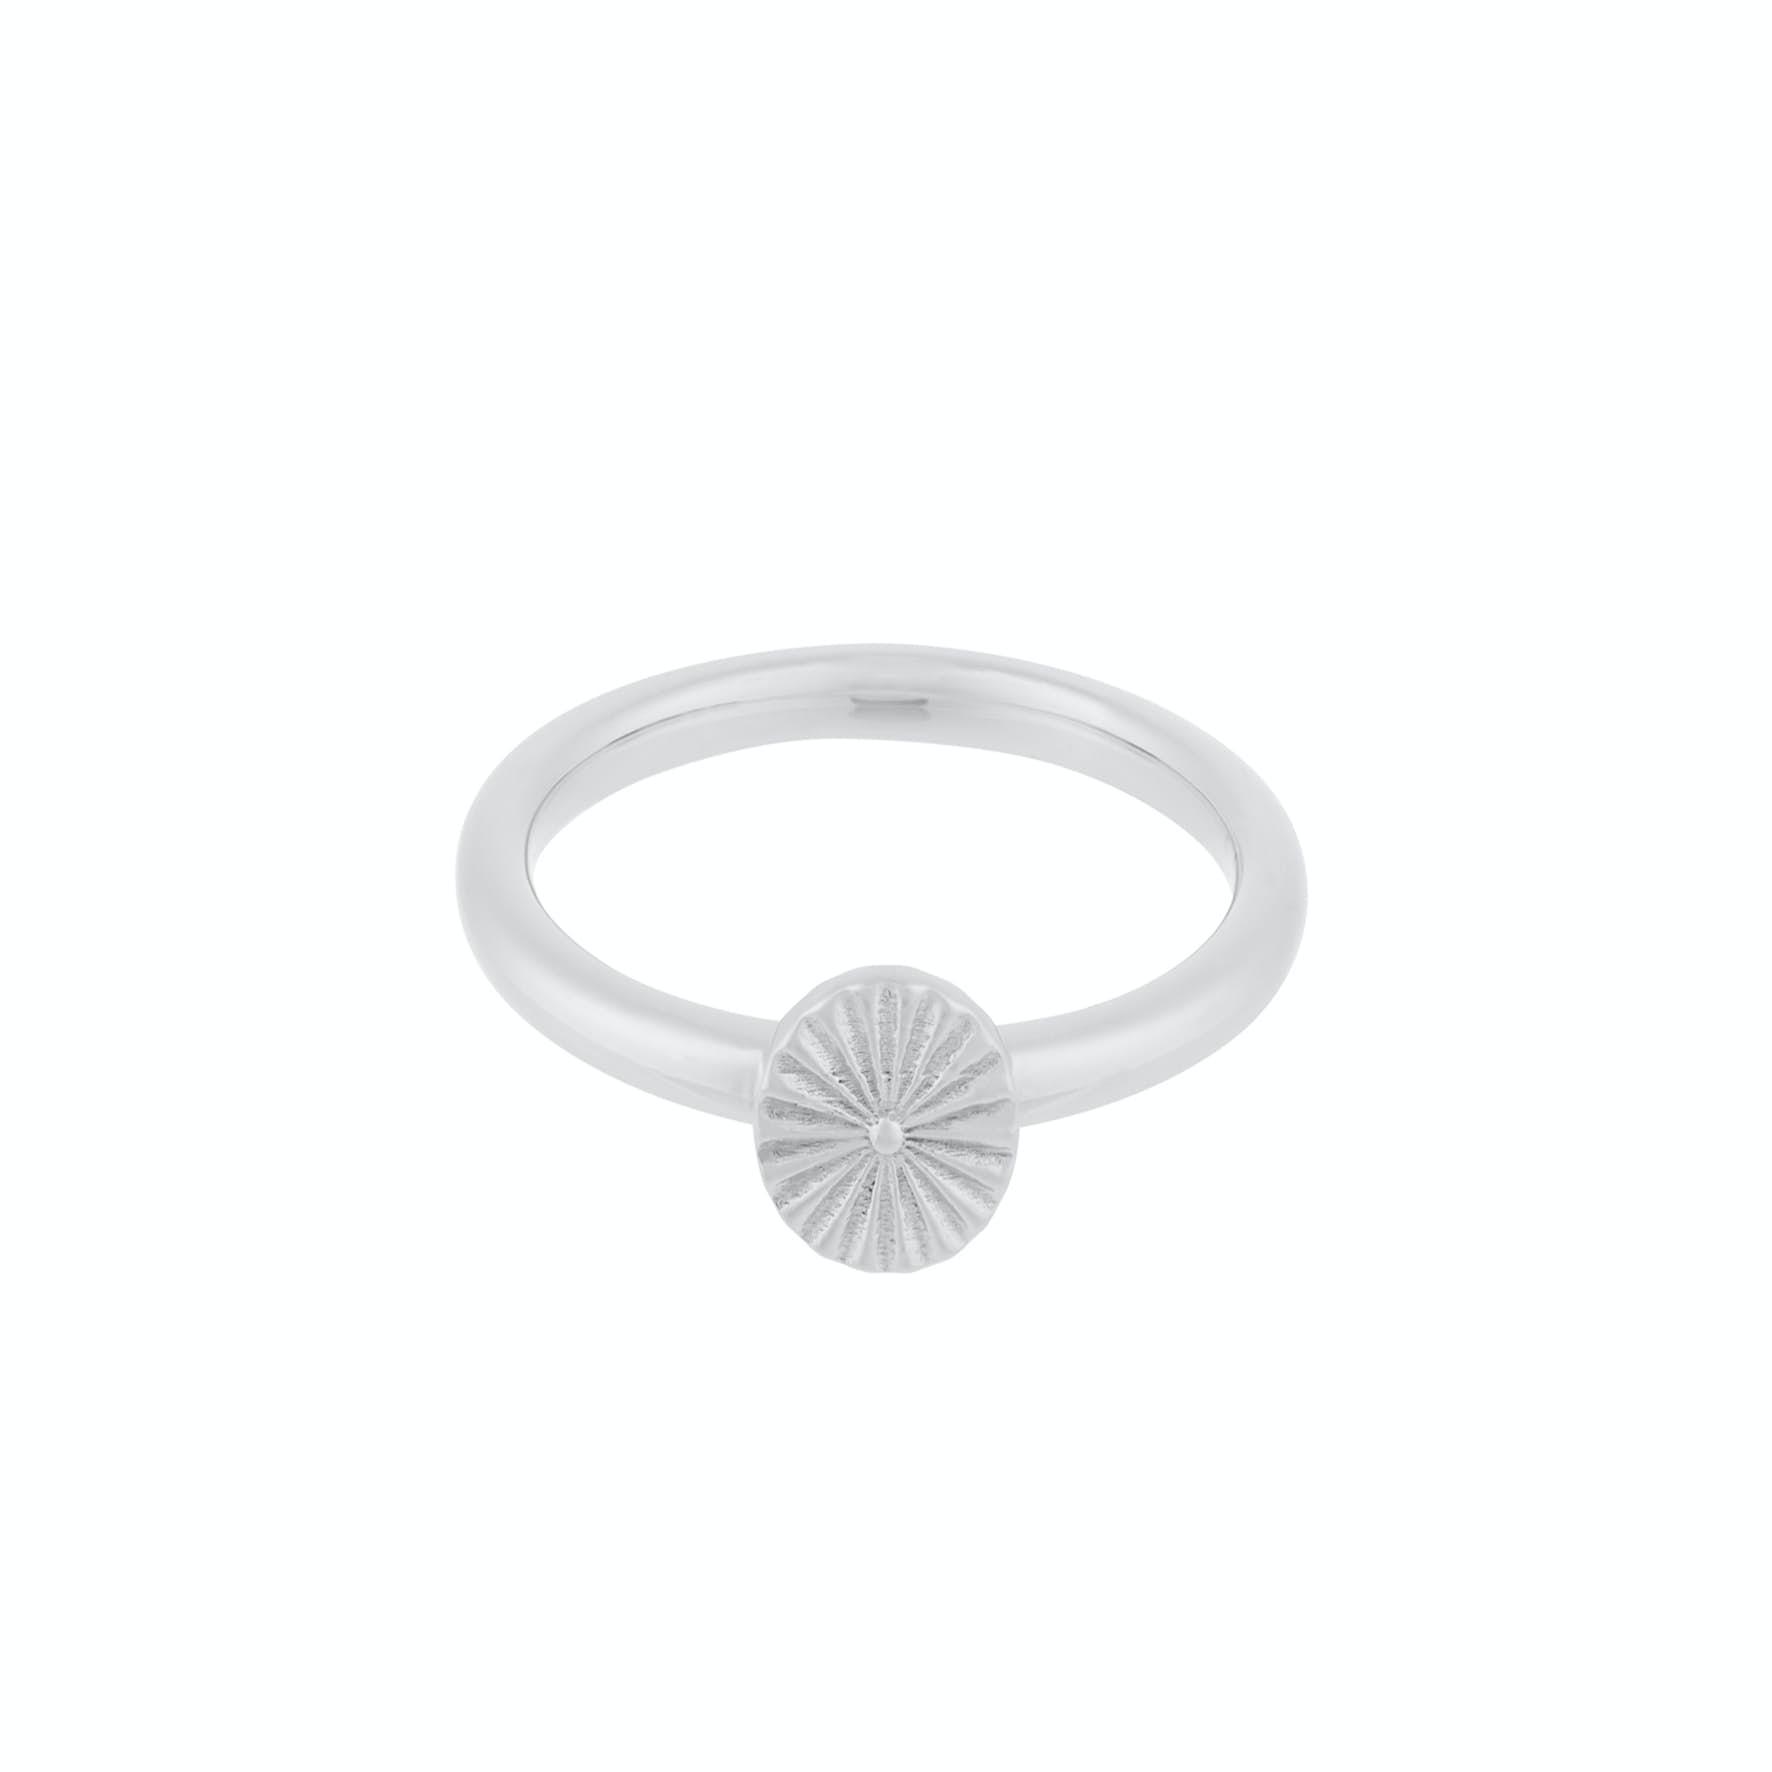 Small Sun Ring von Pernille Corydon in Silber Sterling 925